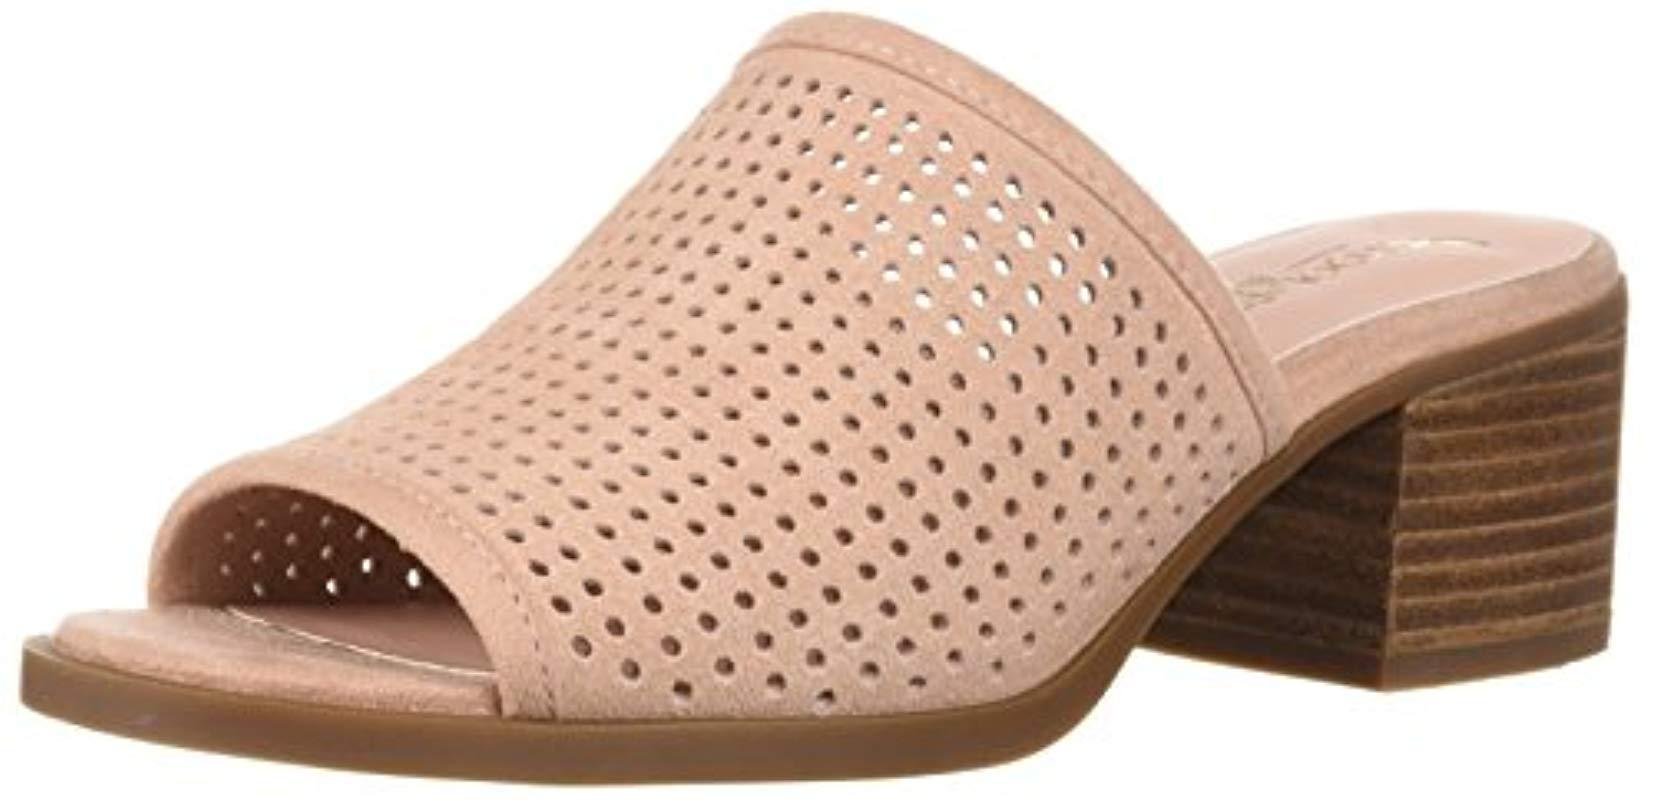 d94f041d116 Lyst - UGG W Raychel Slide Sandal - Save 20%